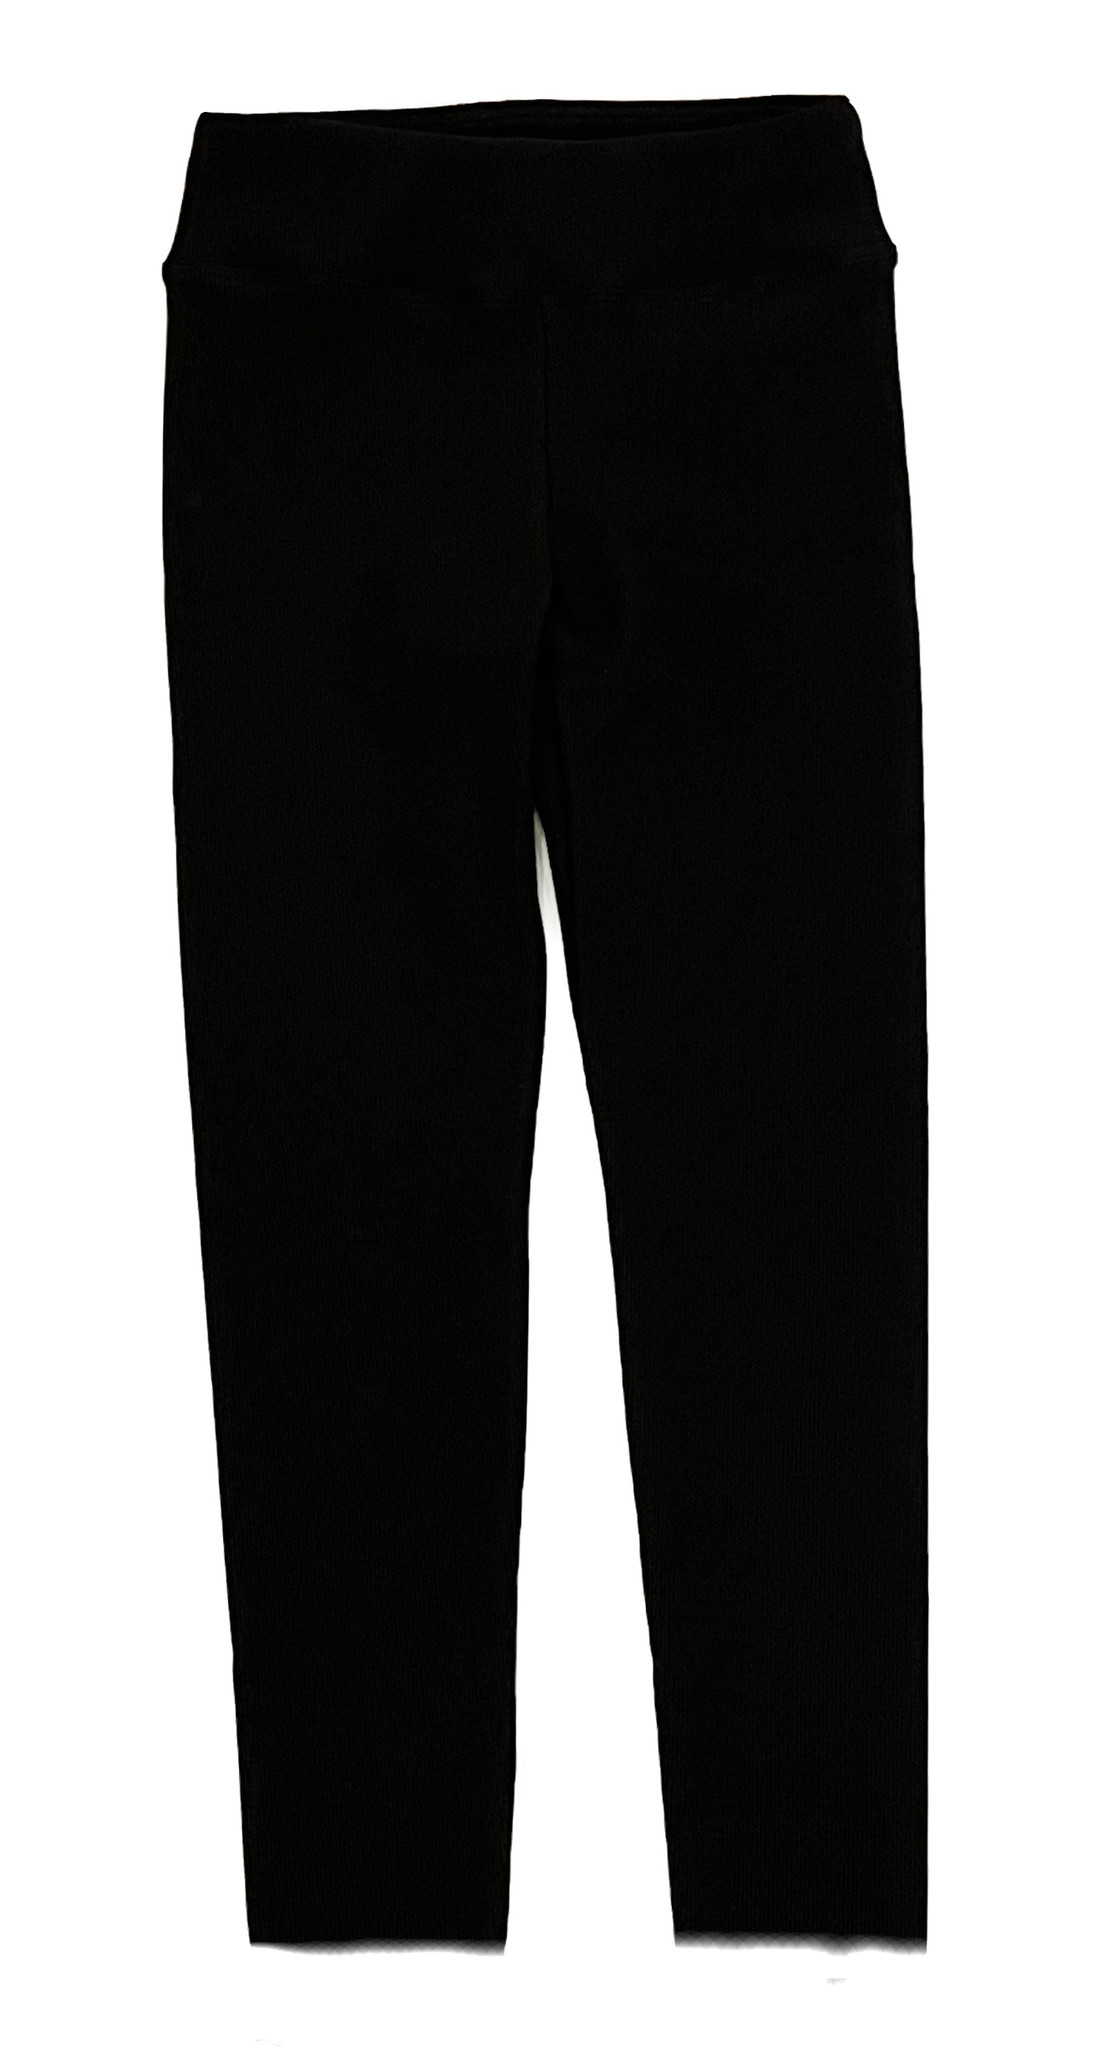 SLS Black Thick Ribbed Legging